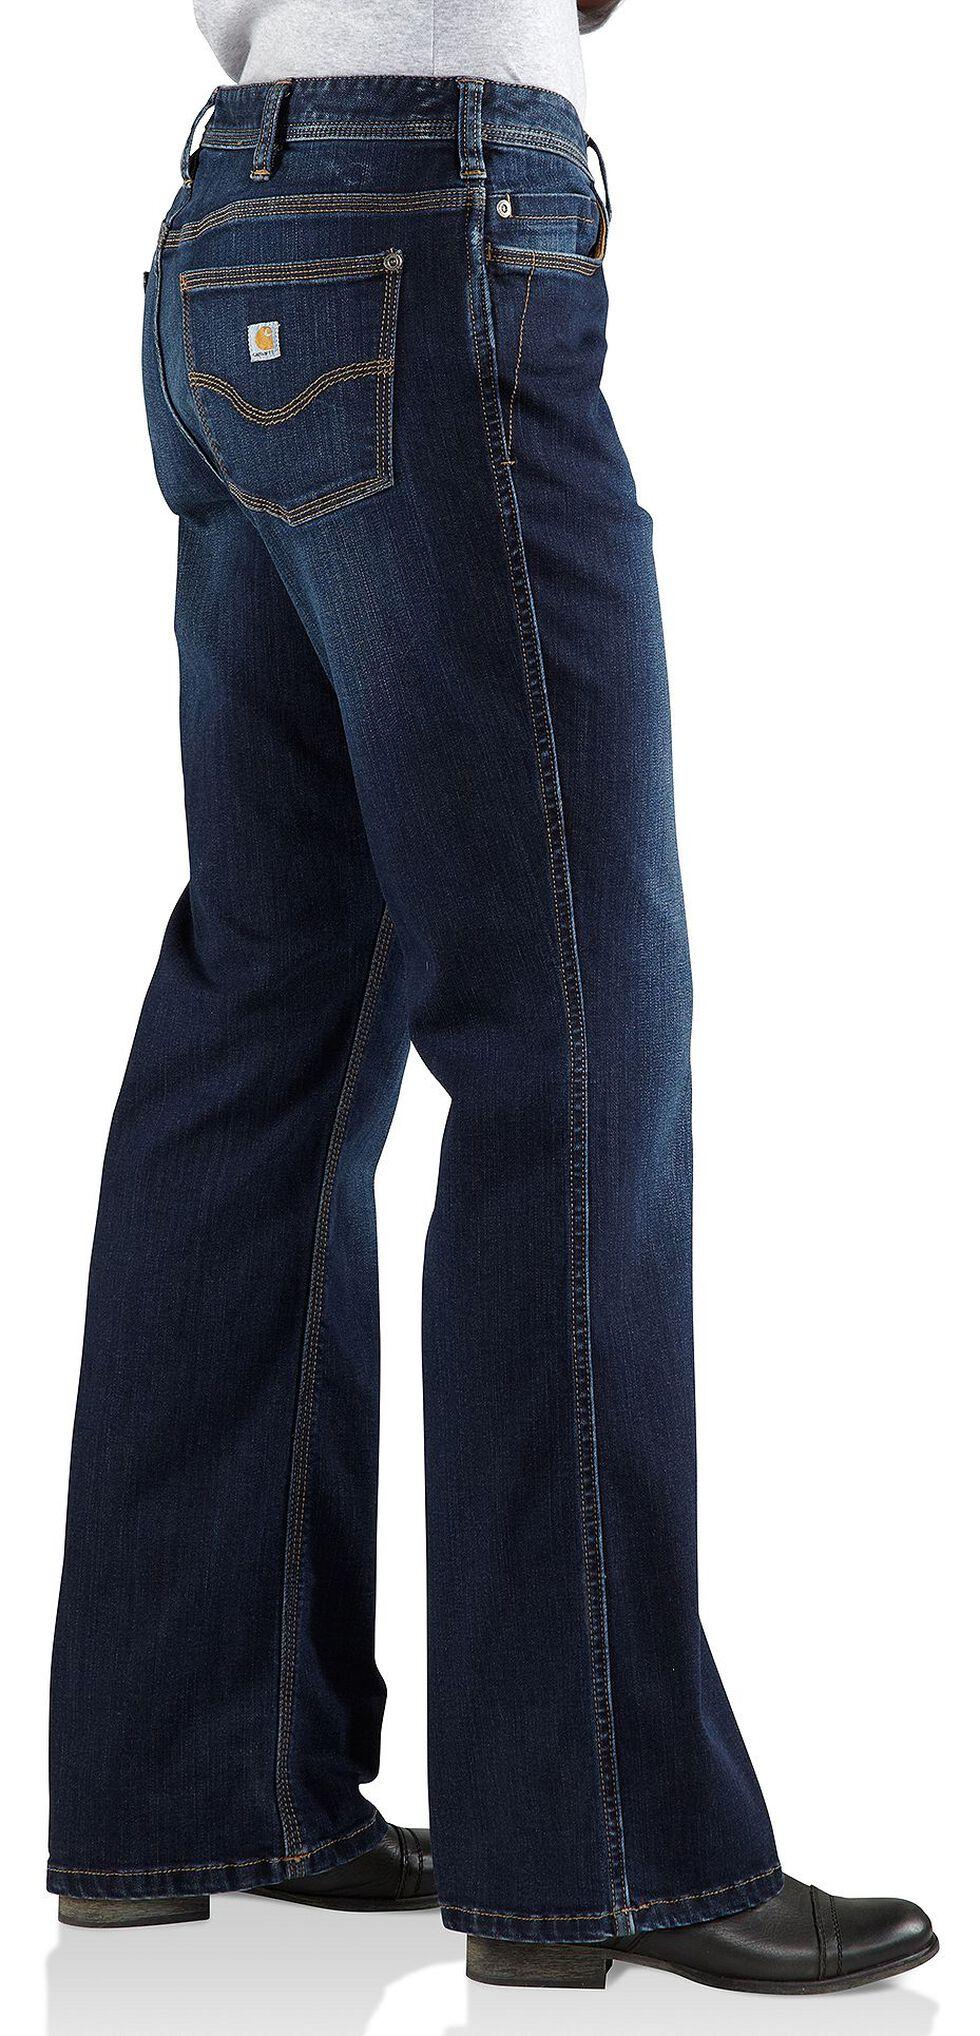 Carhartt Women's Relaxed Fit Denim Jasper Jeans, Dark Indigo, hi-res